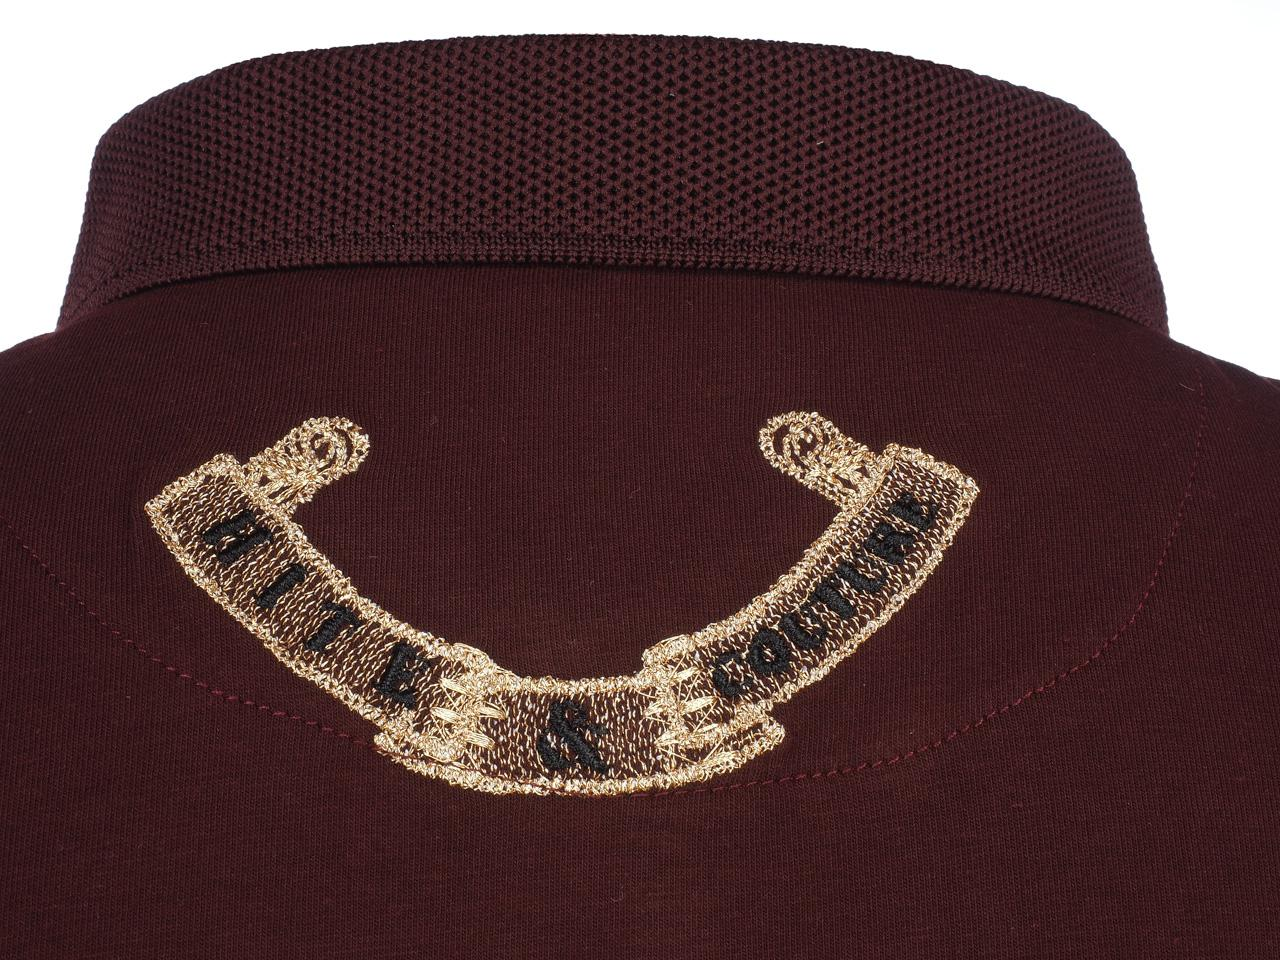 Short-Sleeve-Polo-Hite-Couture-Pamiler-Bordeaux-Mc-Polo-Red-11573-New thumbnail 4